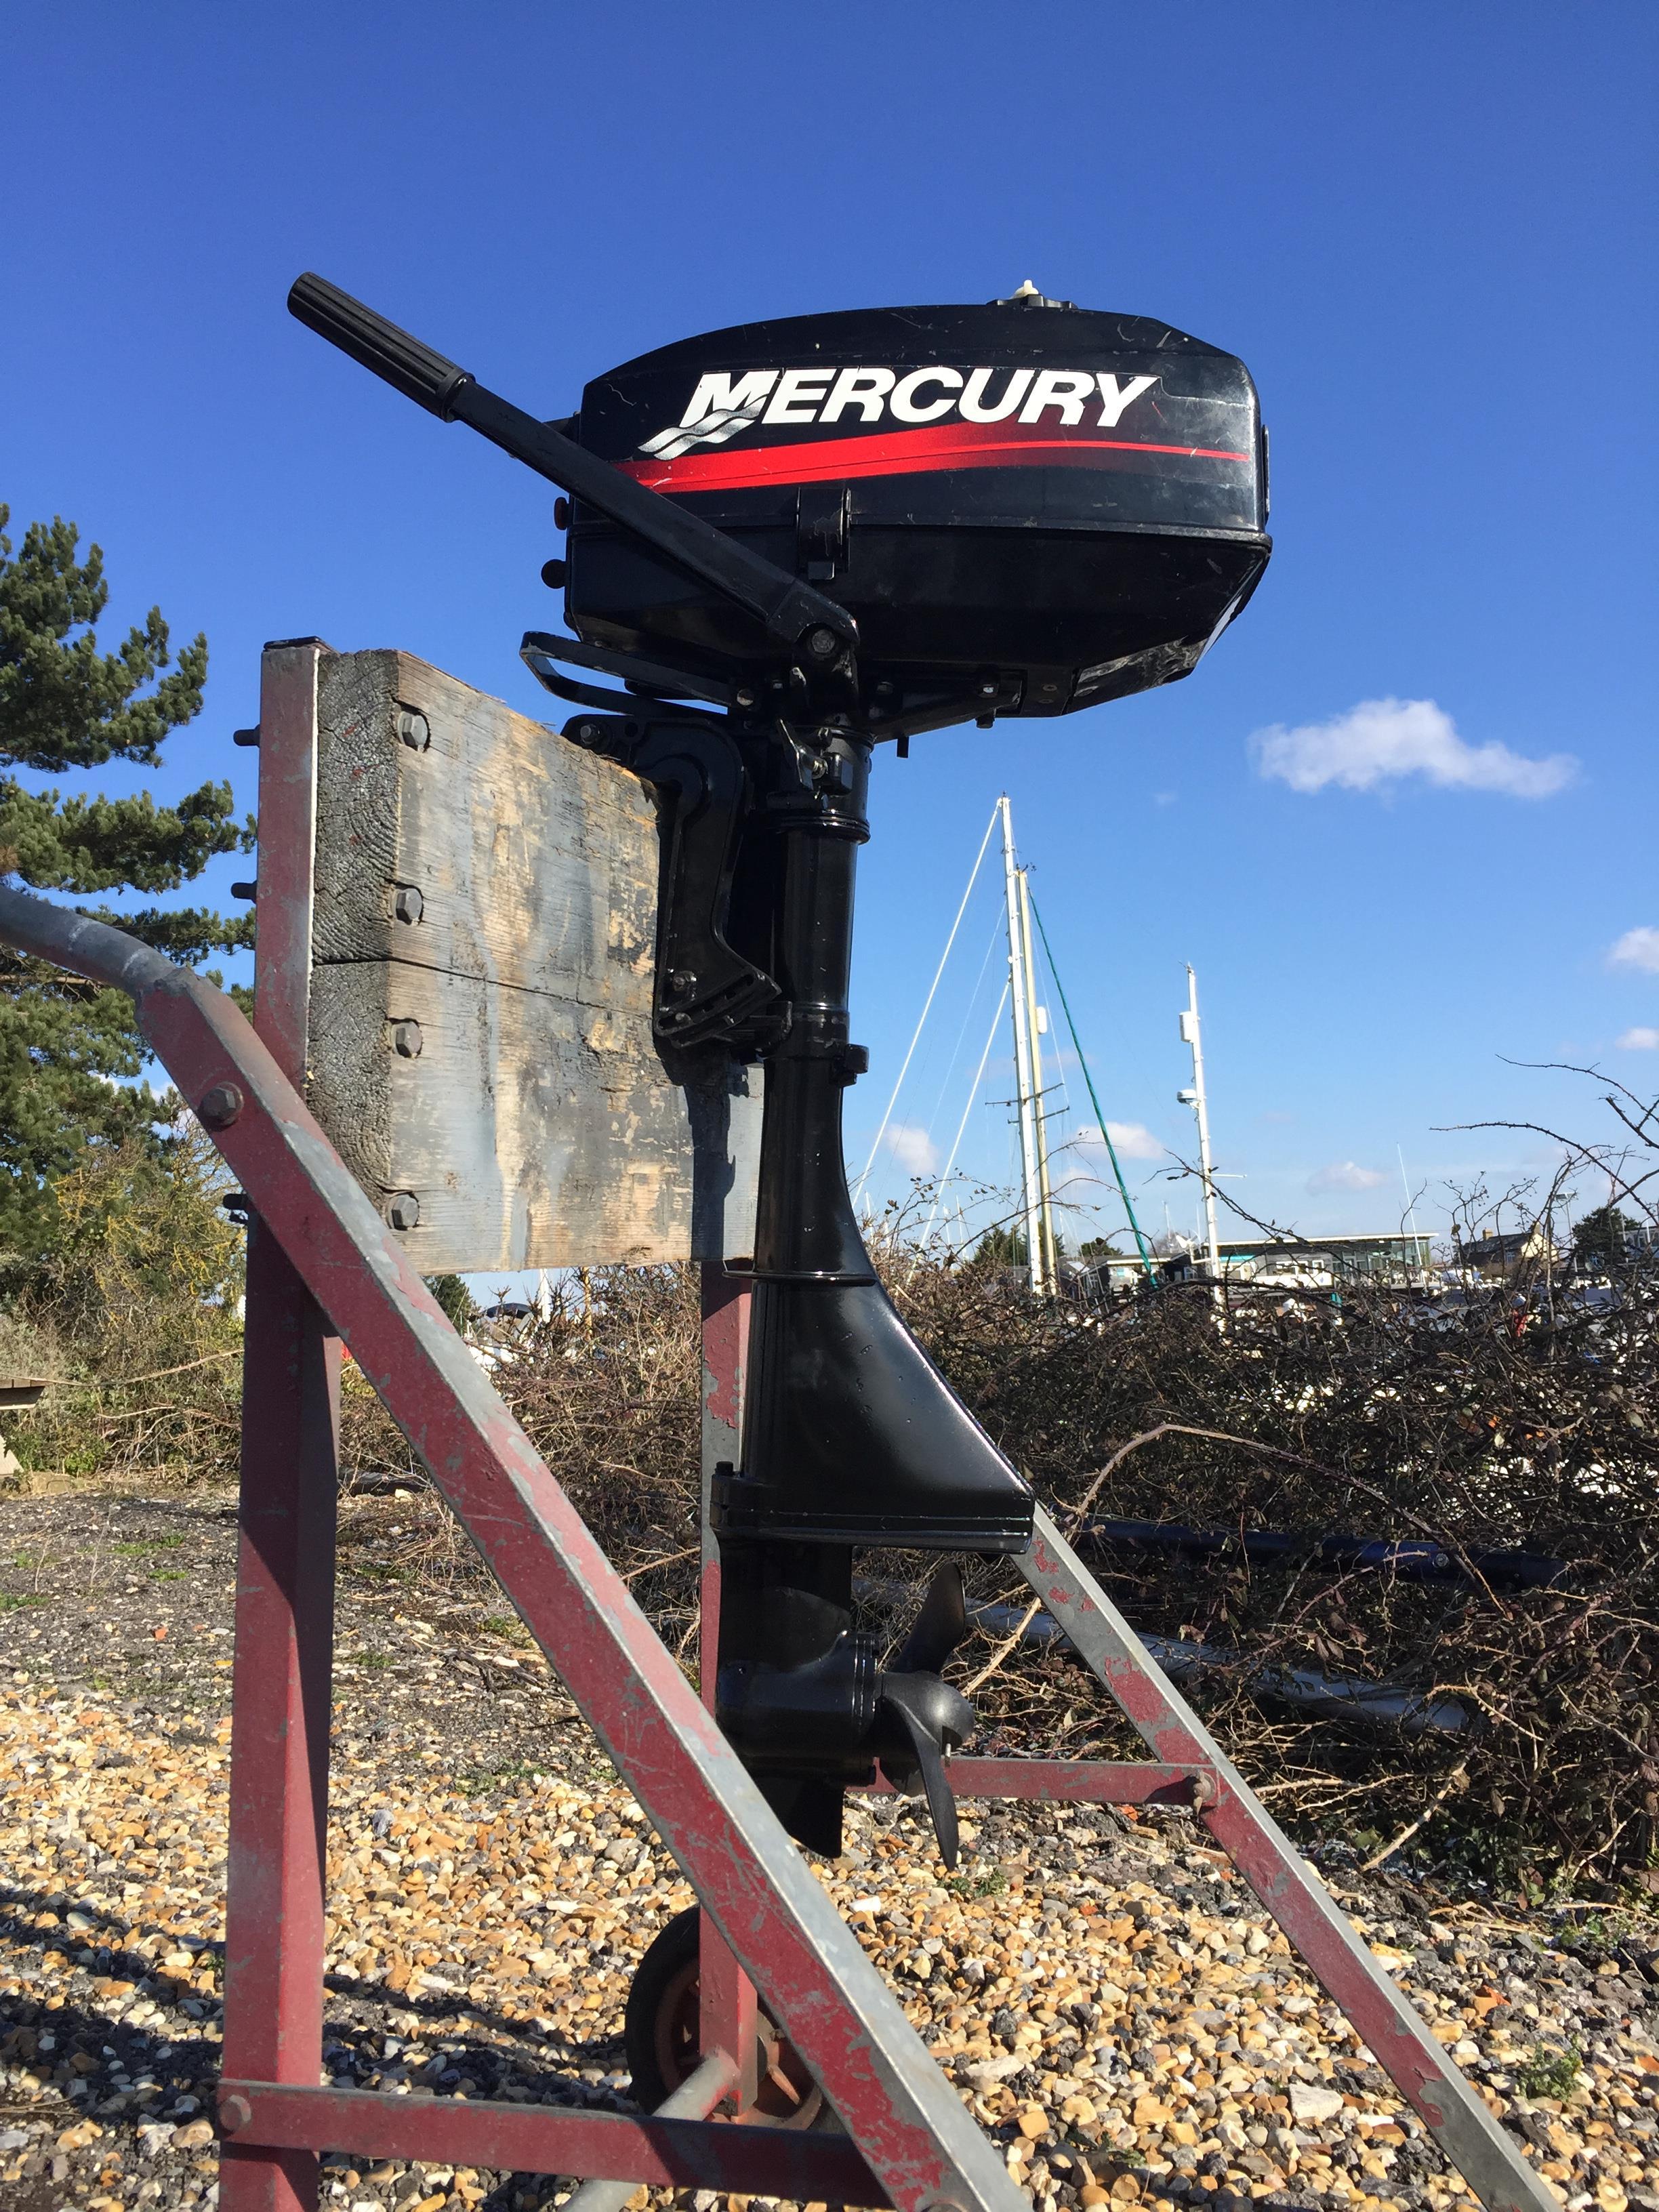 Mercury 2 5 2-stroke standard shaft - Emsworth Outboards